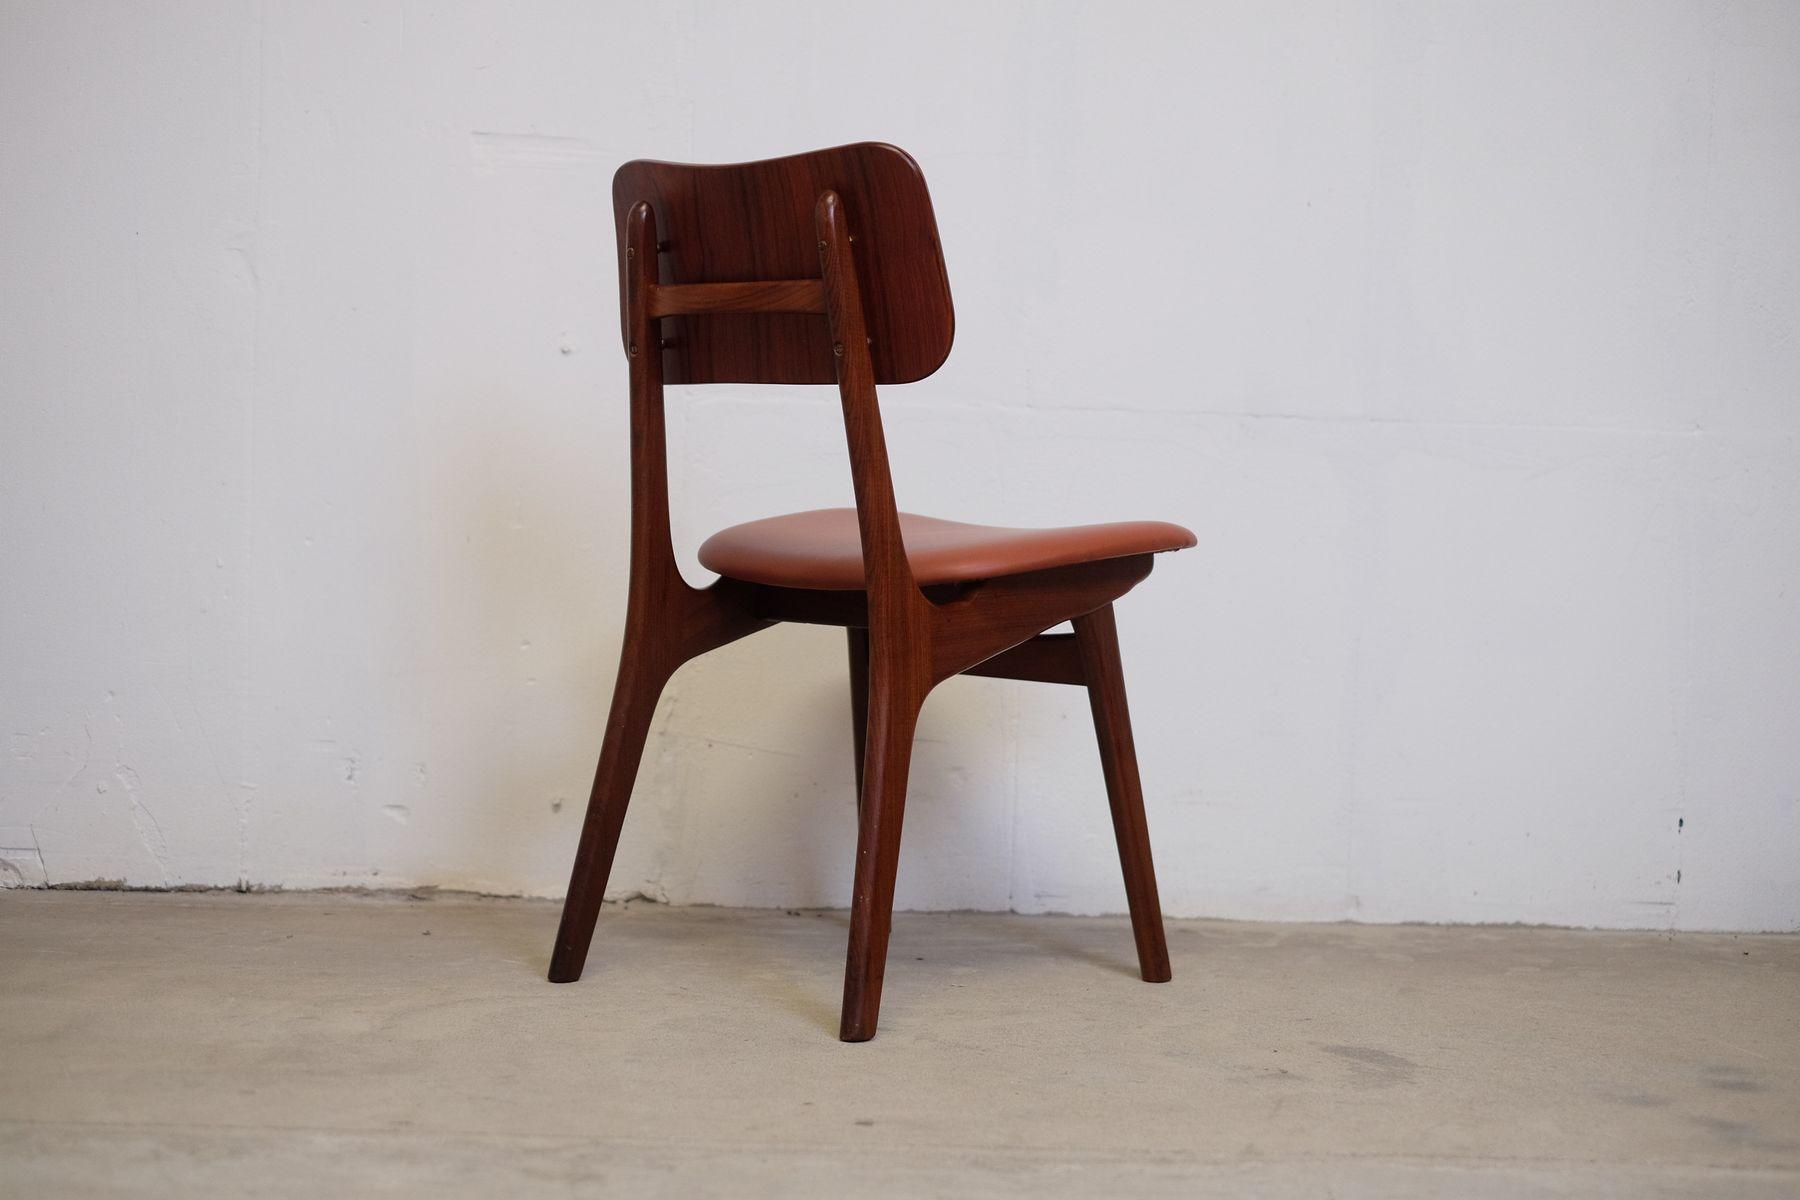 mid century side chair by ib kofod larsen for christensen larsen for sale at pamono. Black Bedroom Furniture Sets. Home Design Ideas